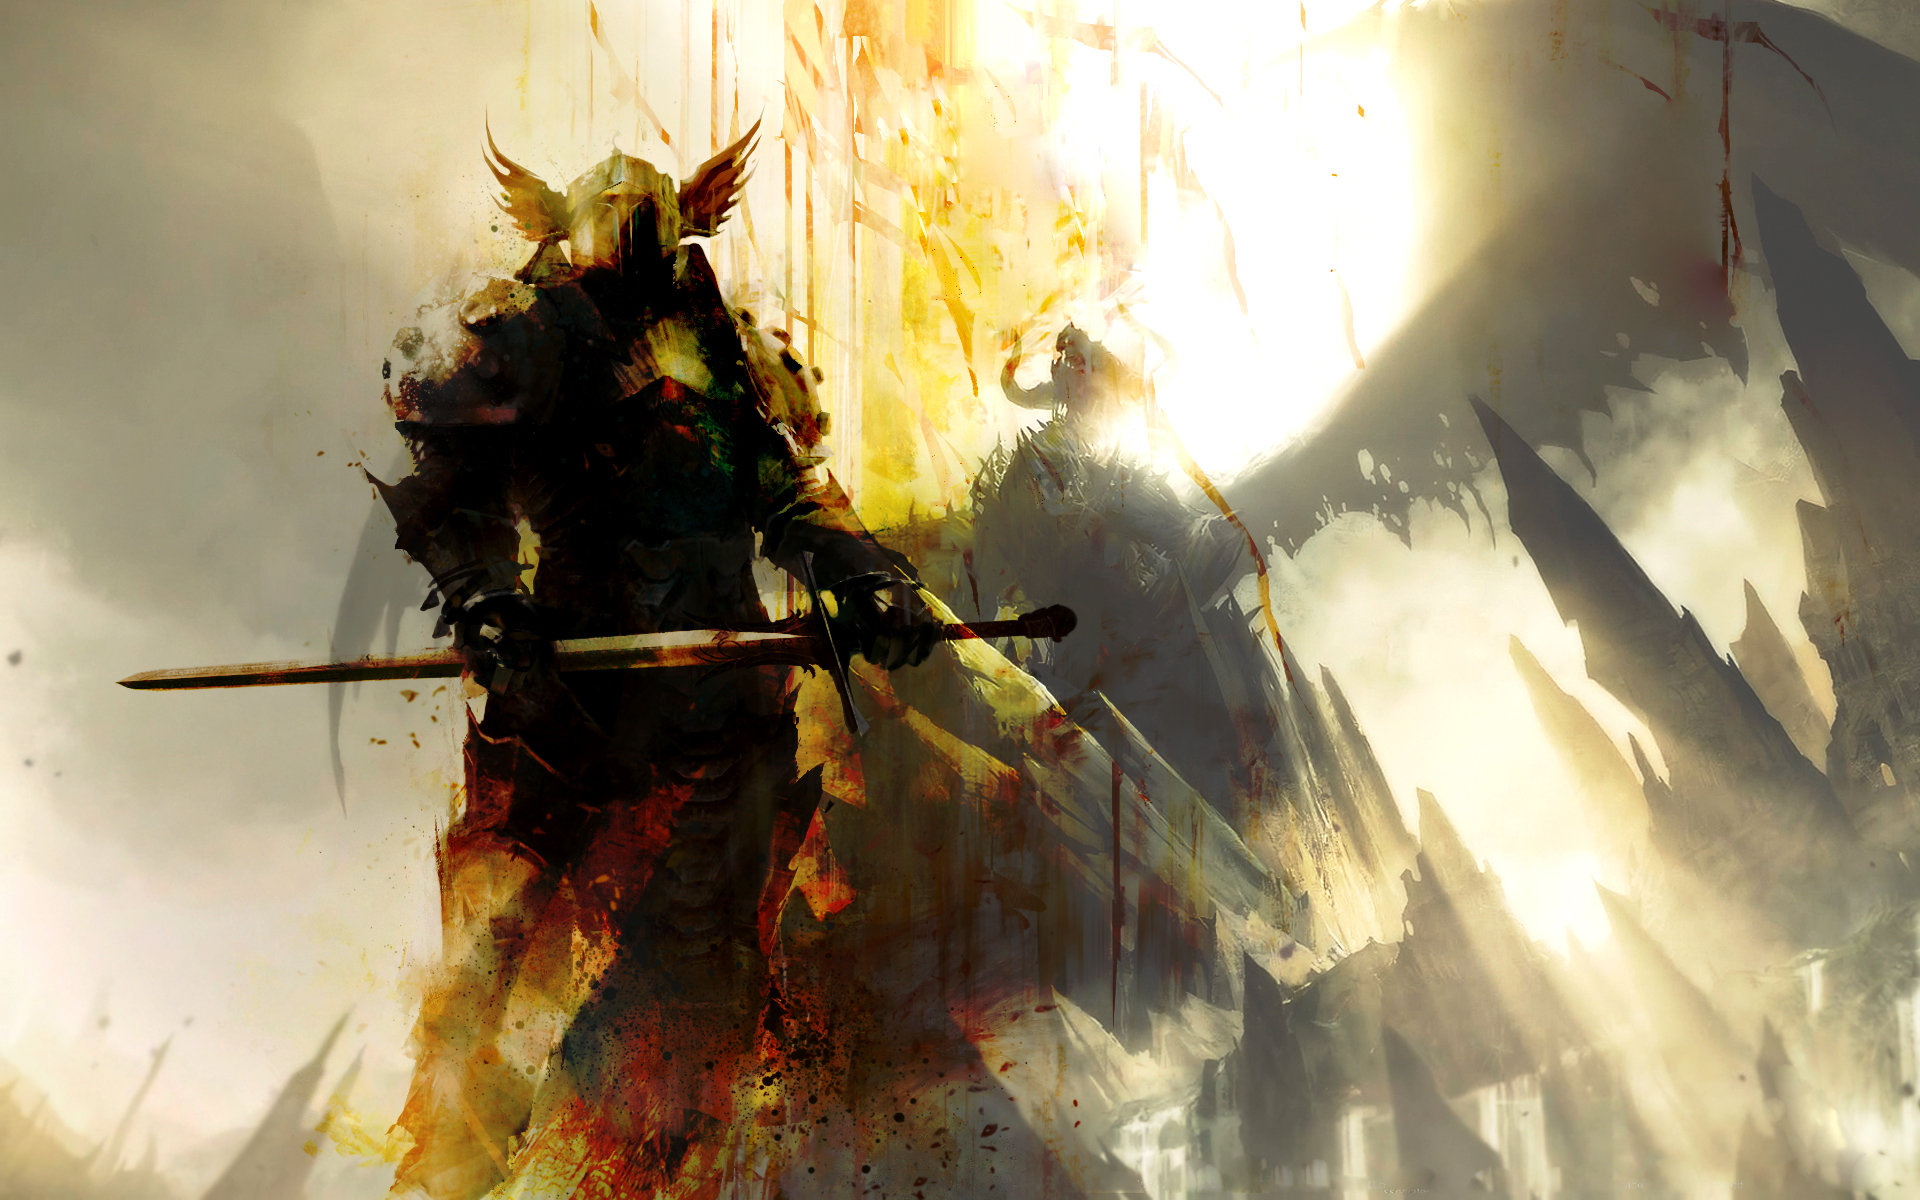 Guild Wars 2 Wallpaper By Fornaxkingspear On Deviantart